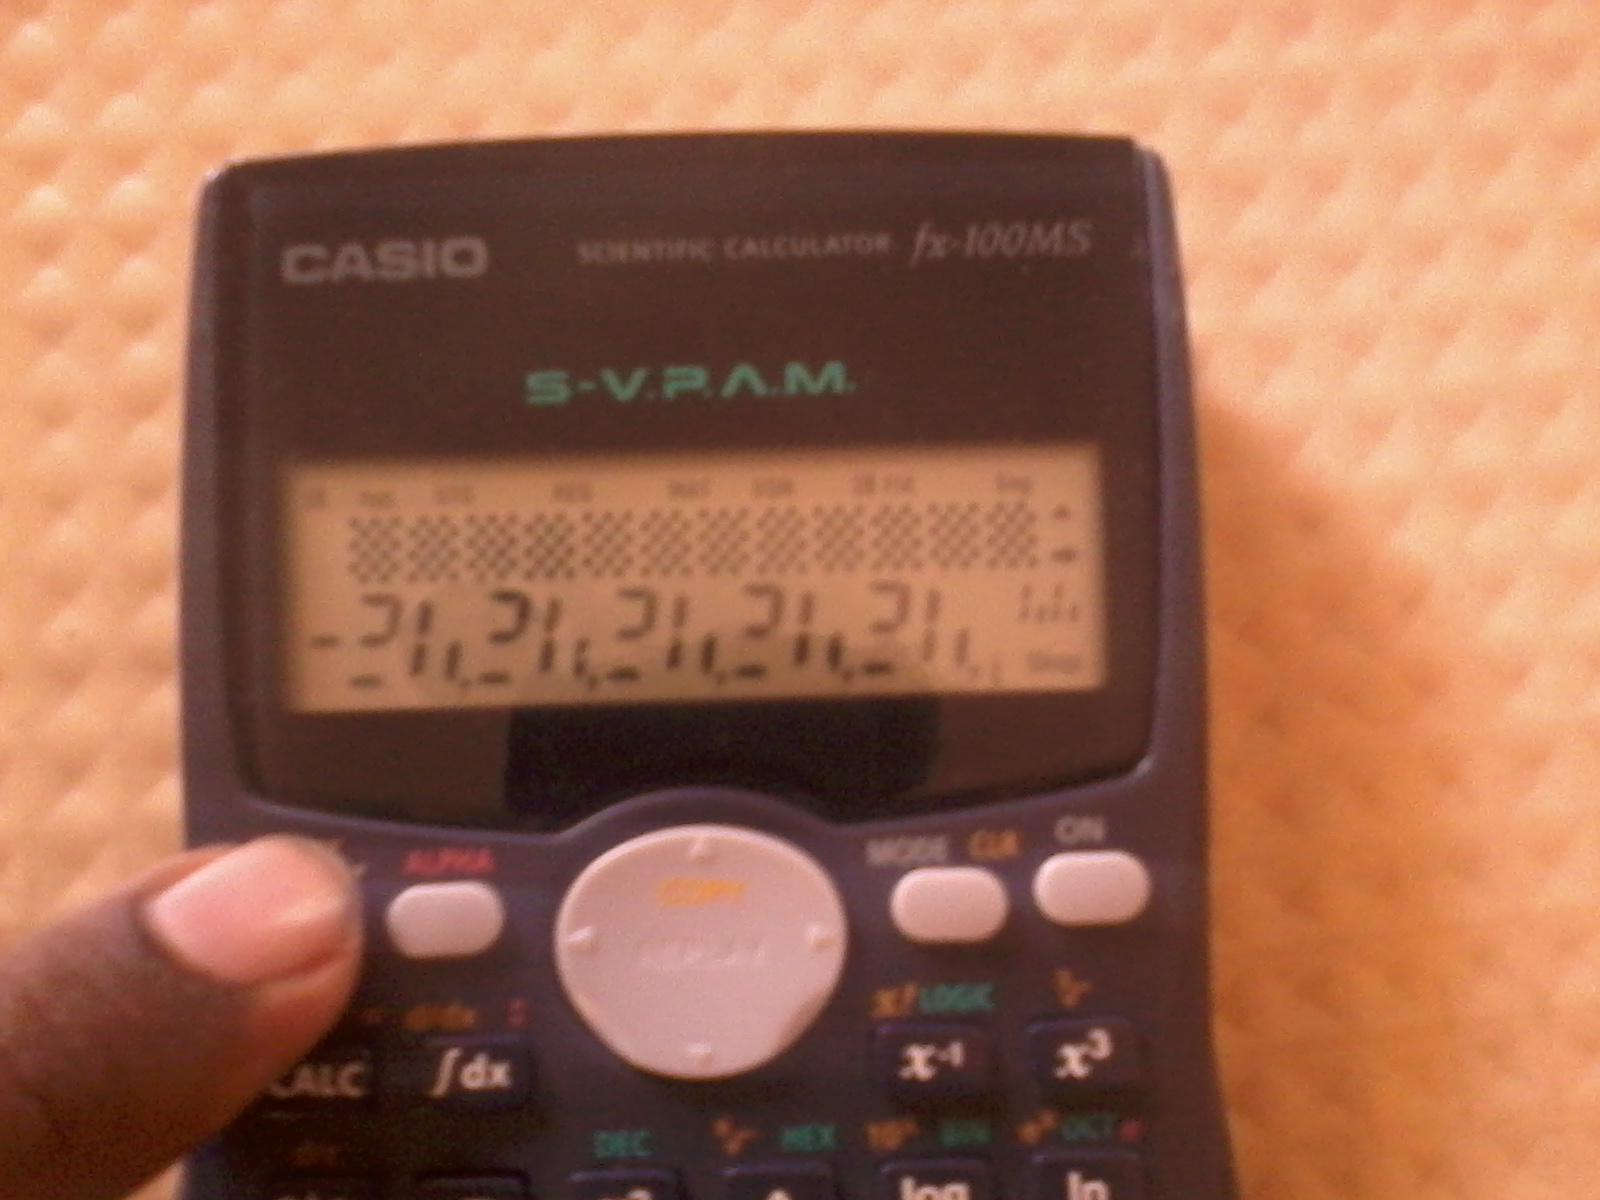 Useful Info How To Find Scientific Calculator Is Original Or Casio